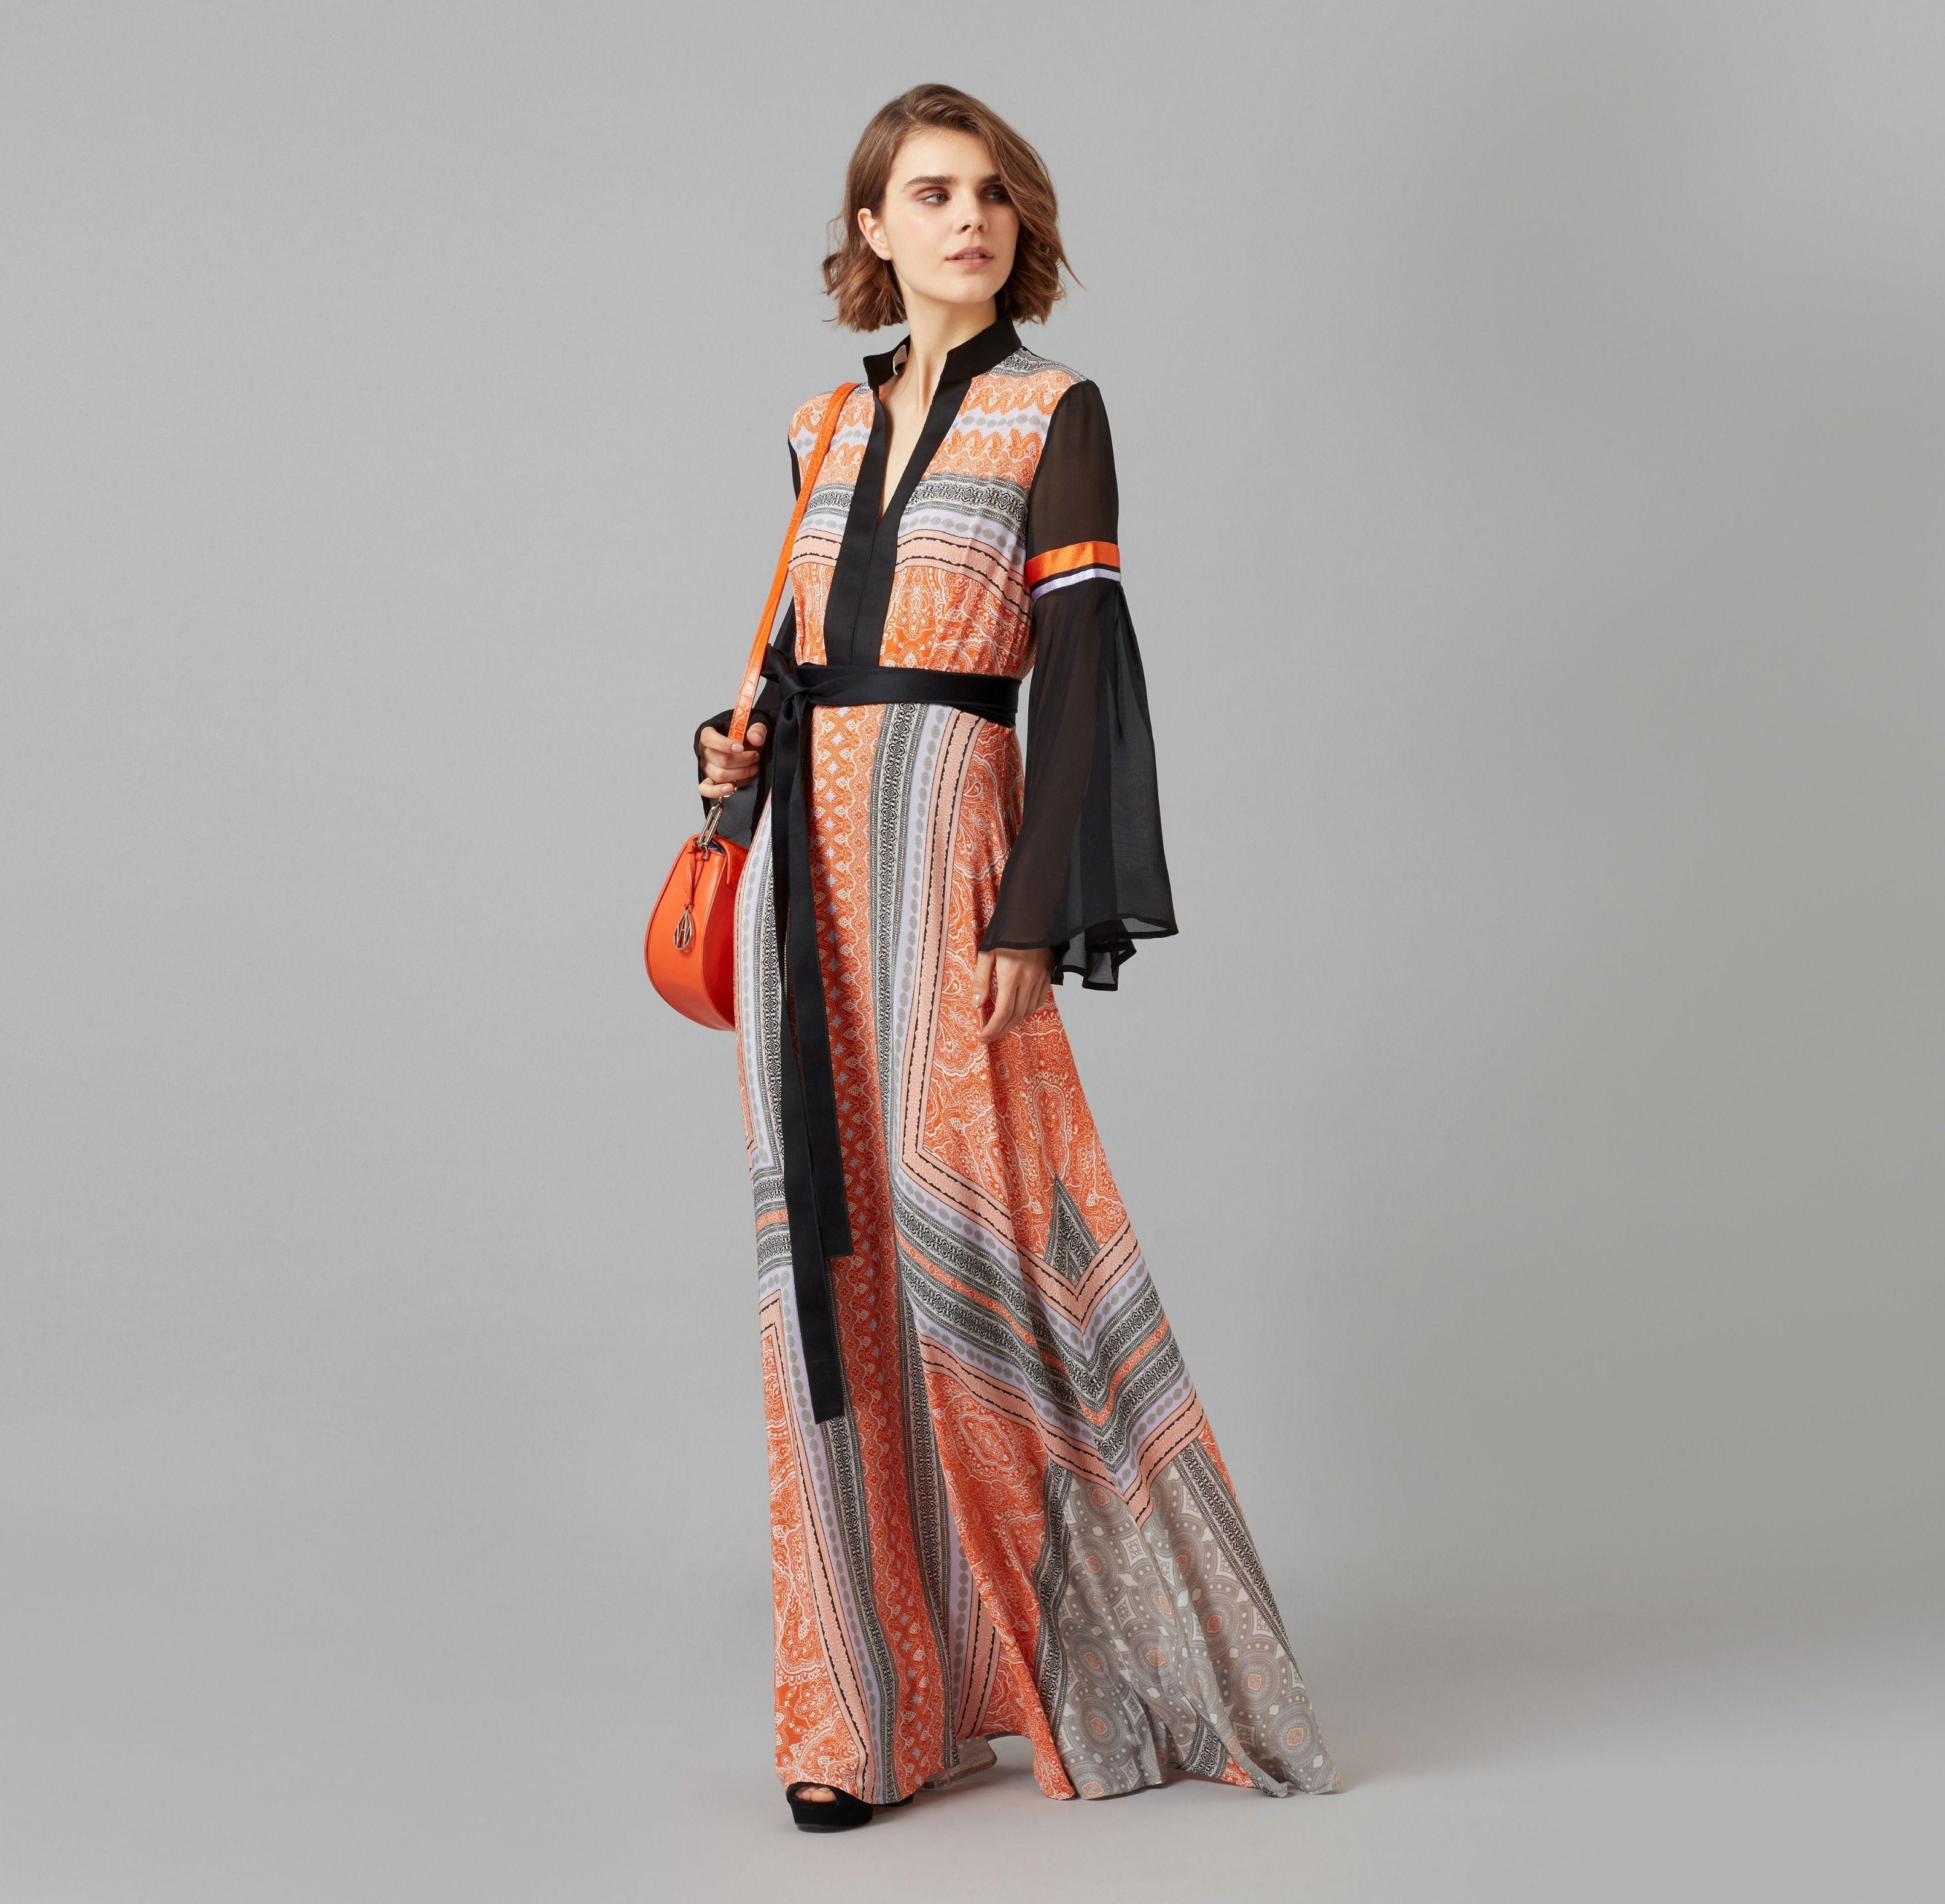 87eaebf8ed71 Amanda Wakeley Clementine & Lilac Printed Maxi Dress - Lyst